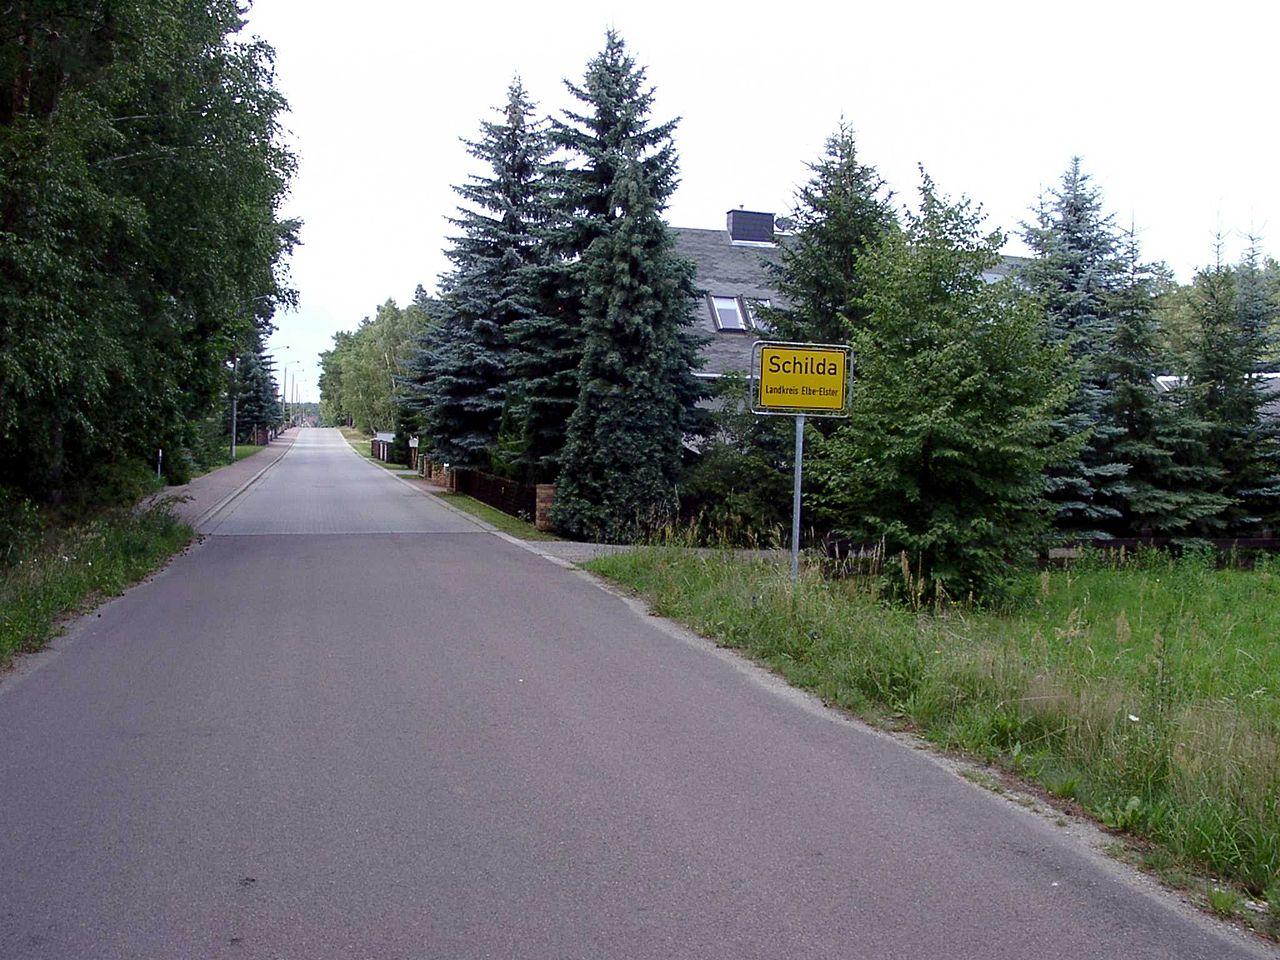 Schilda Eingang.jpg